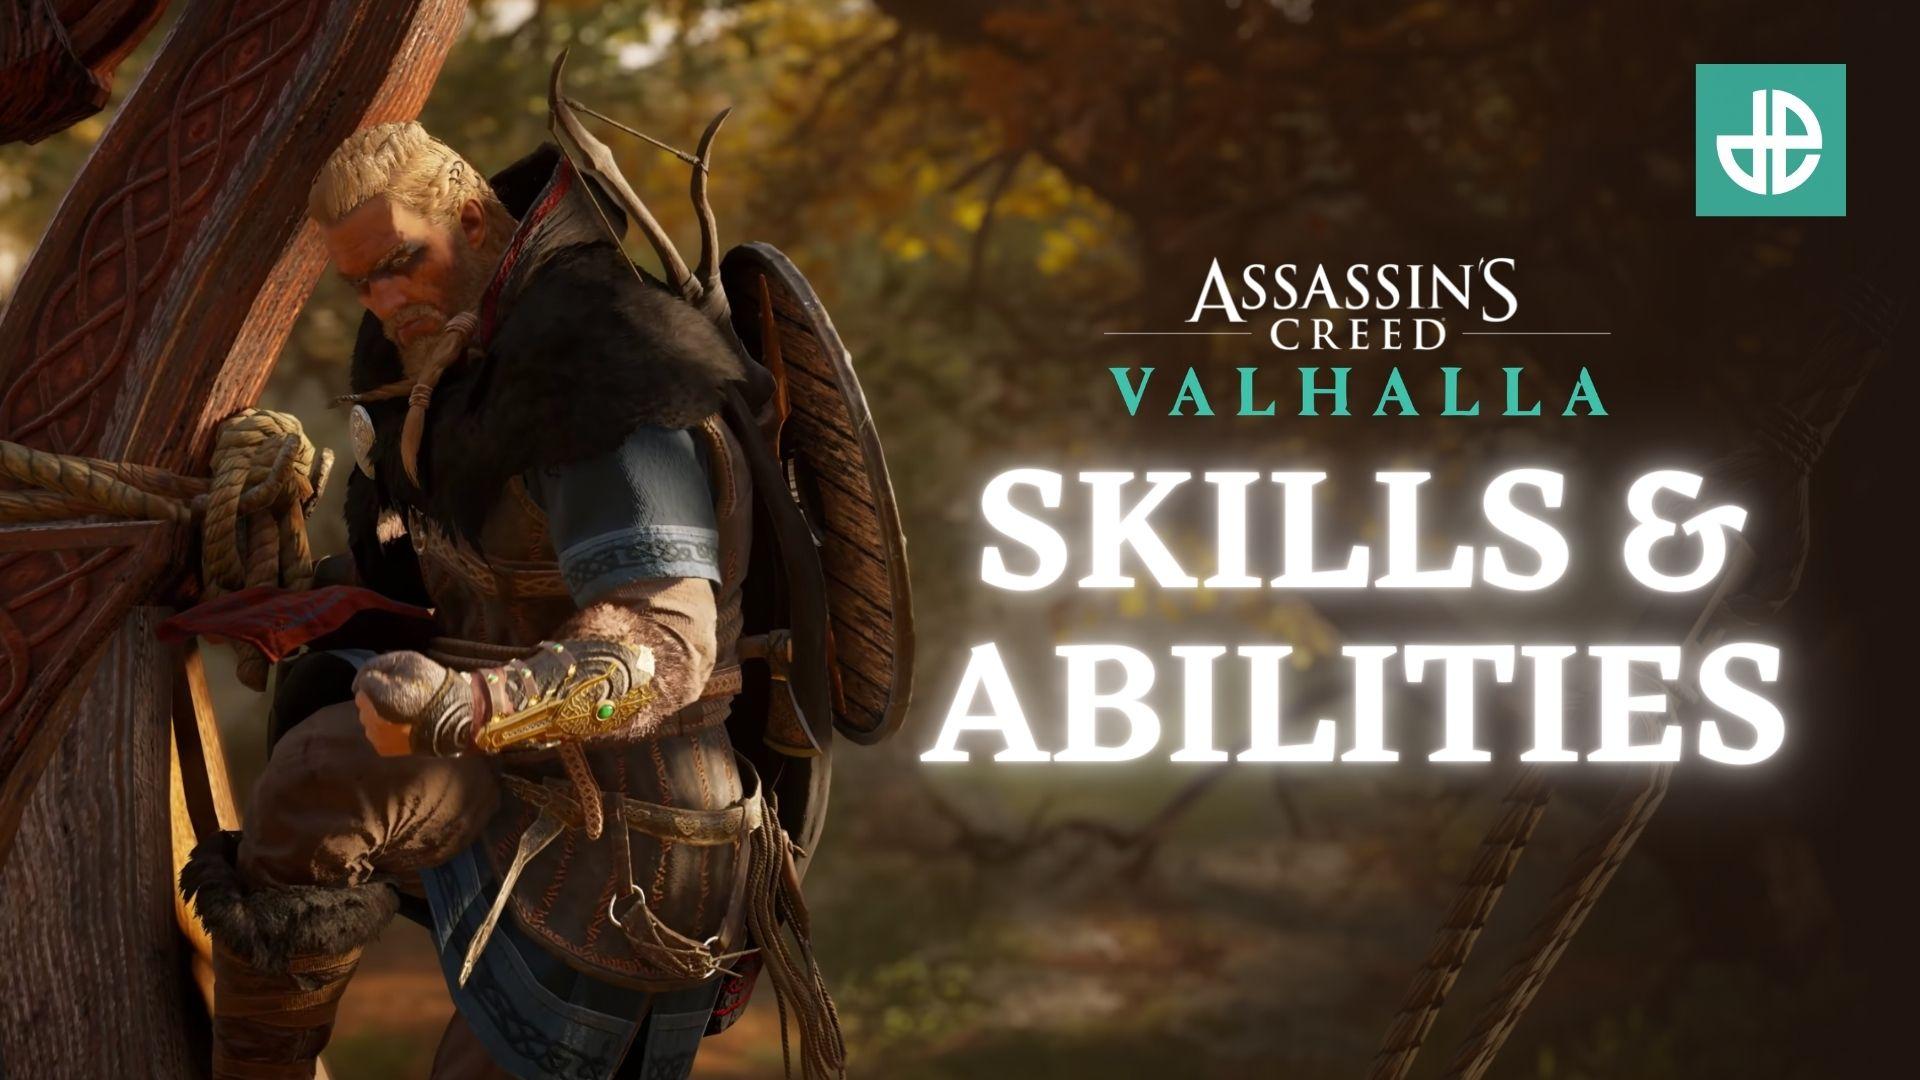 Eivor climbing in Assassin's Creed Valhalla